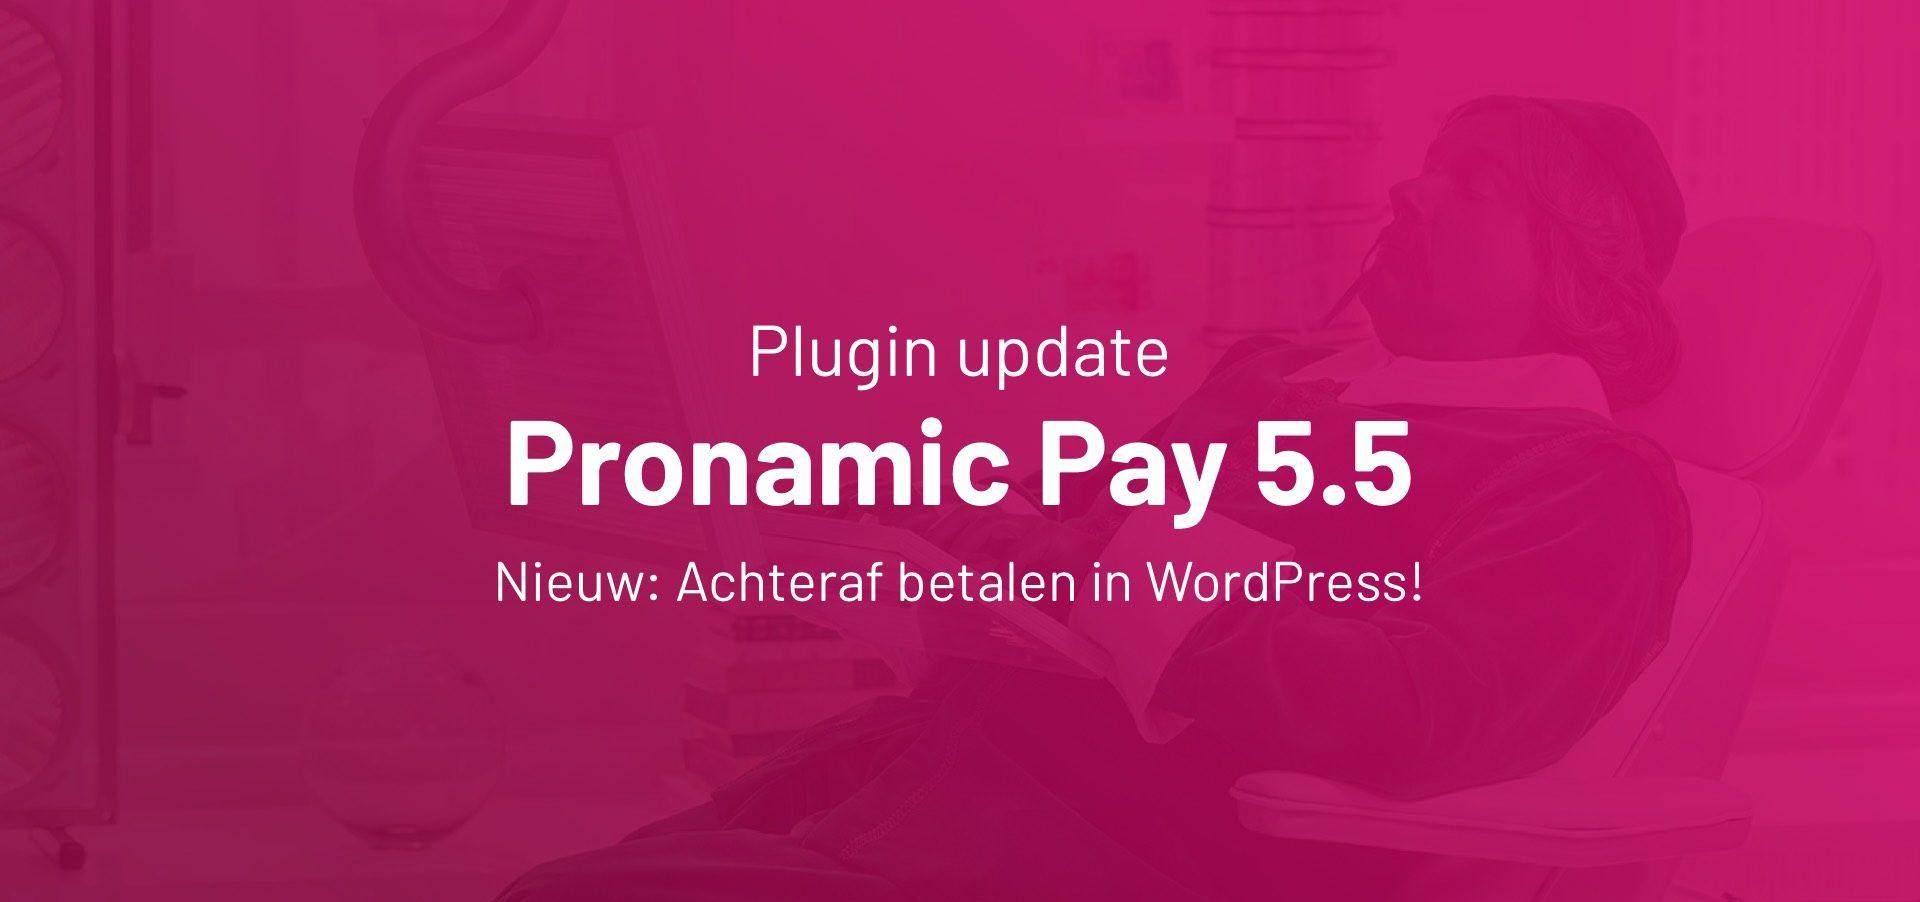 Pronamic Pay 5.5 Achteraf betalen